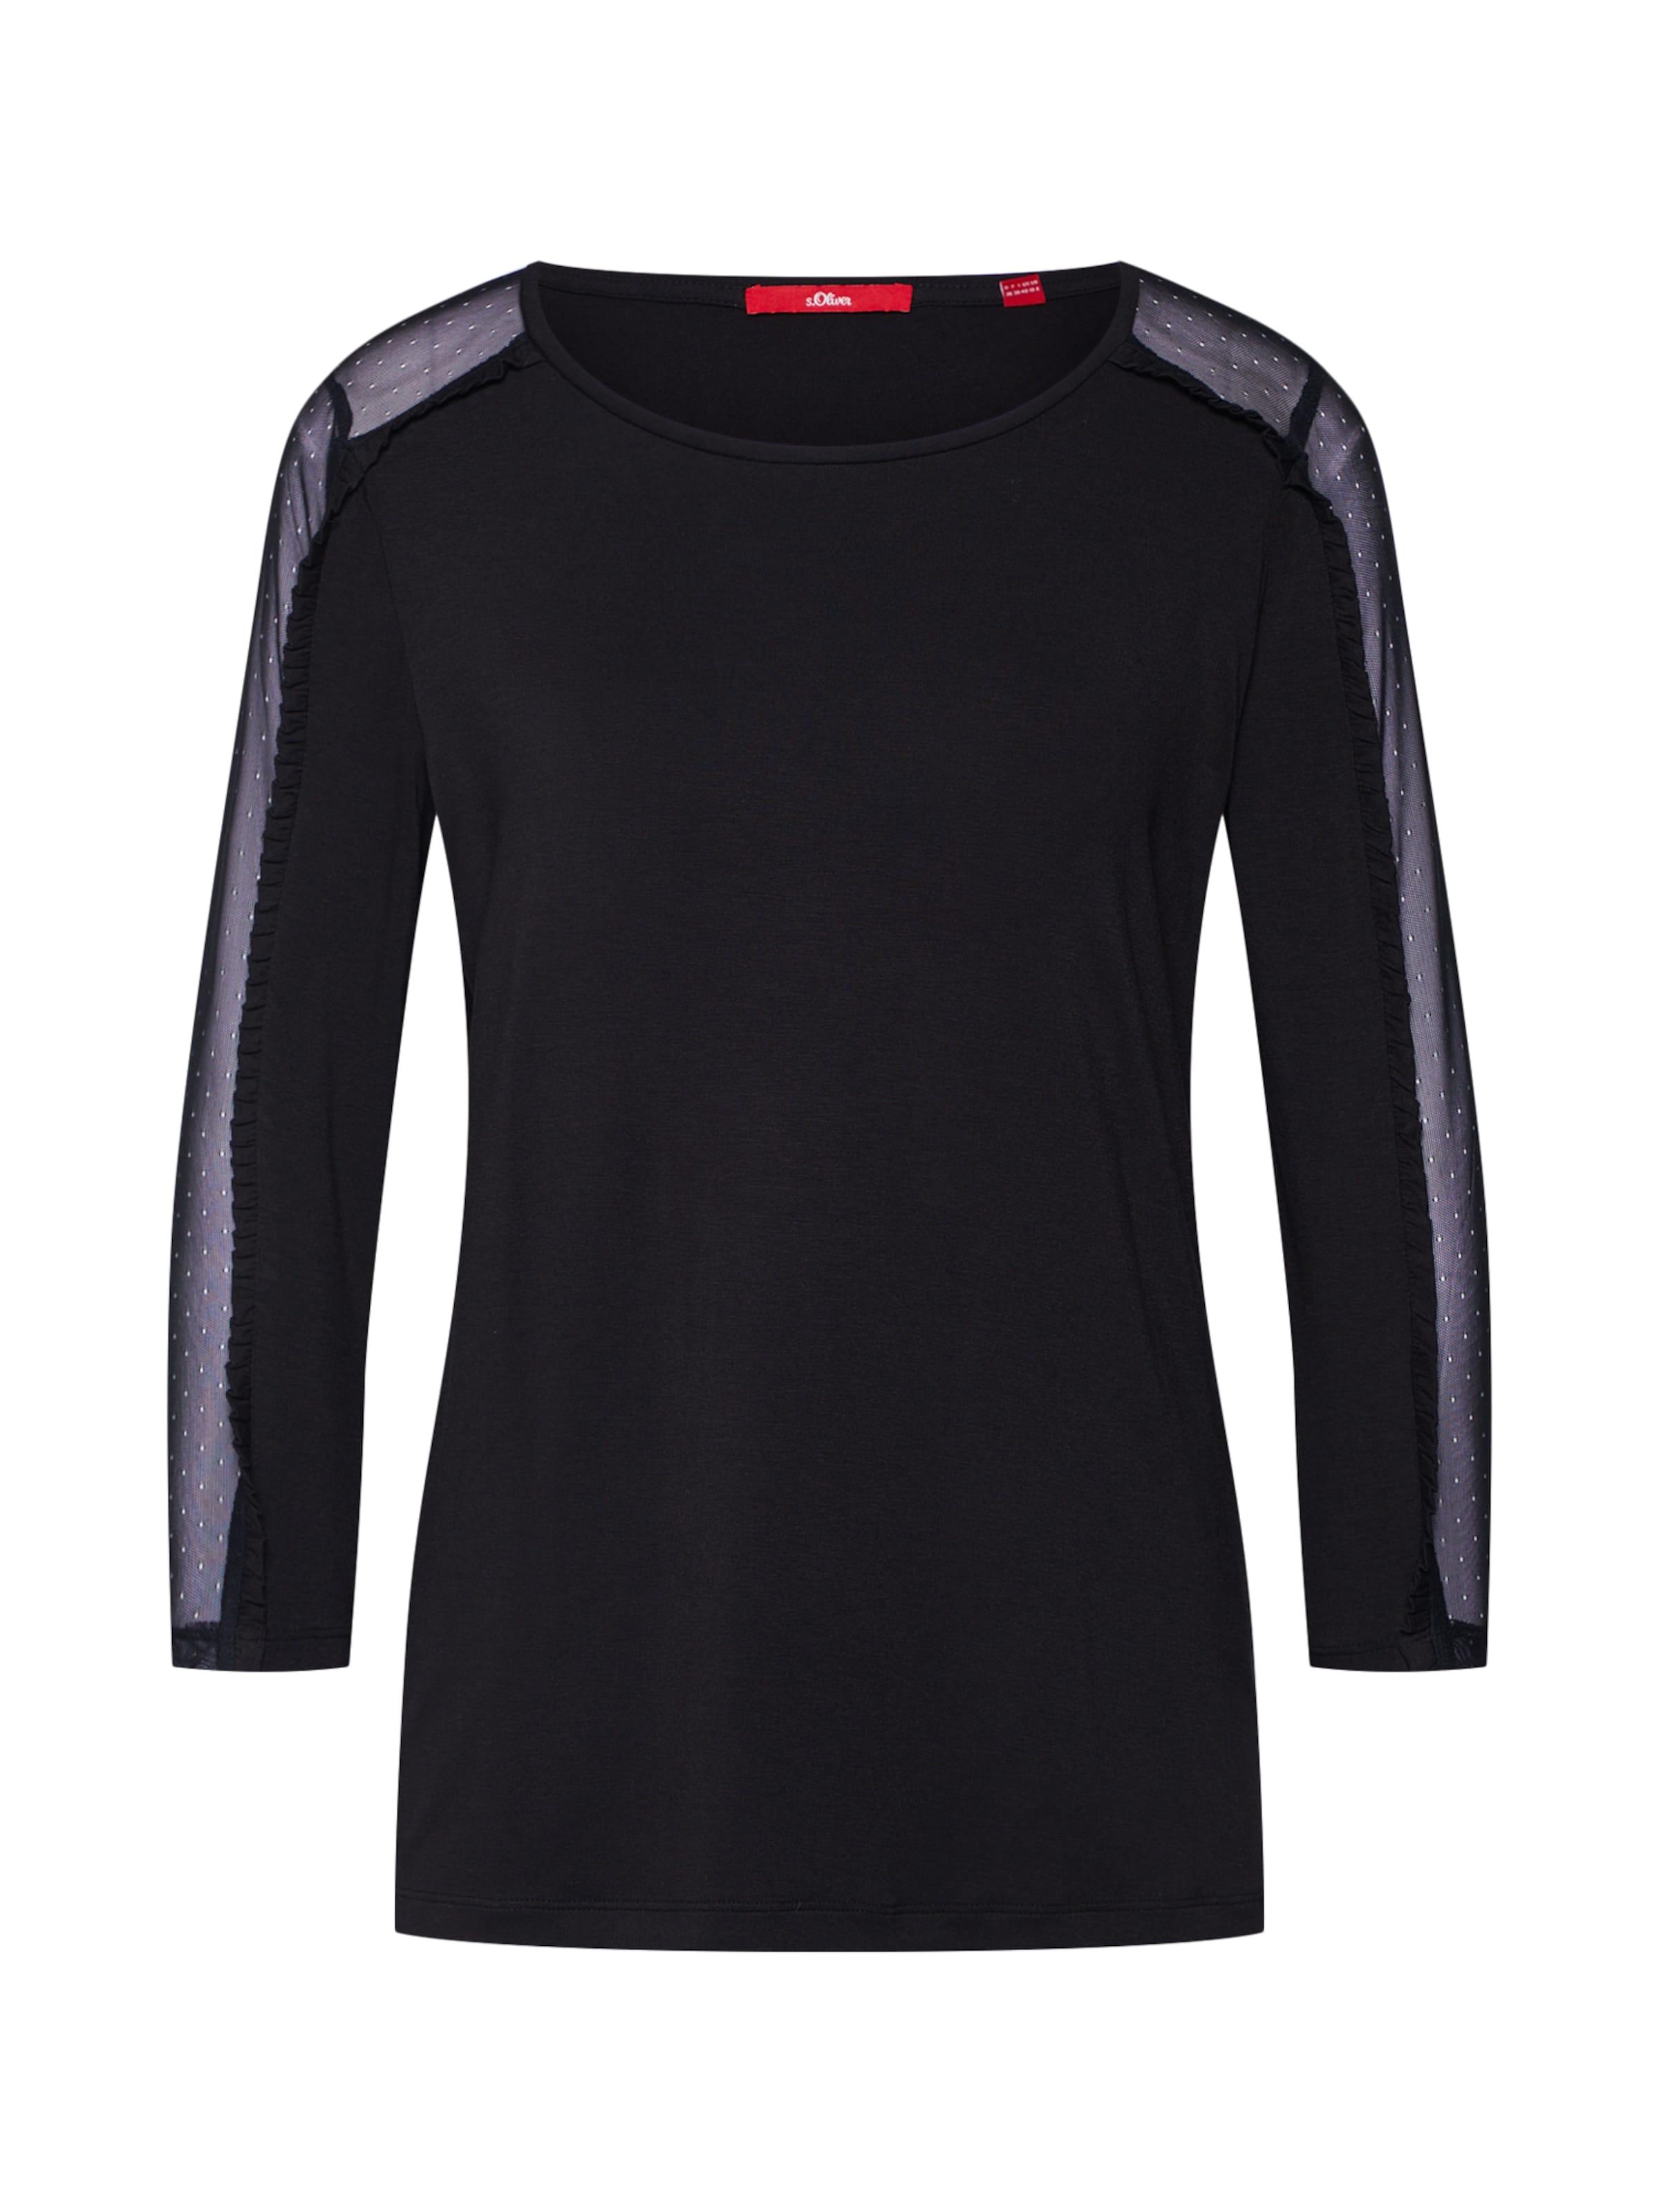 Red Shirt oliver Label Schwarz S In wOk0Pn